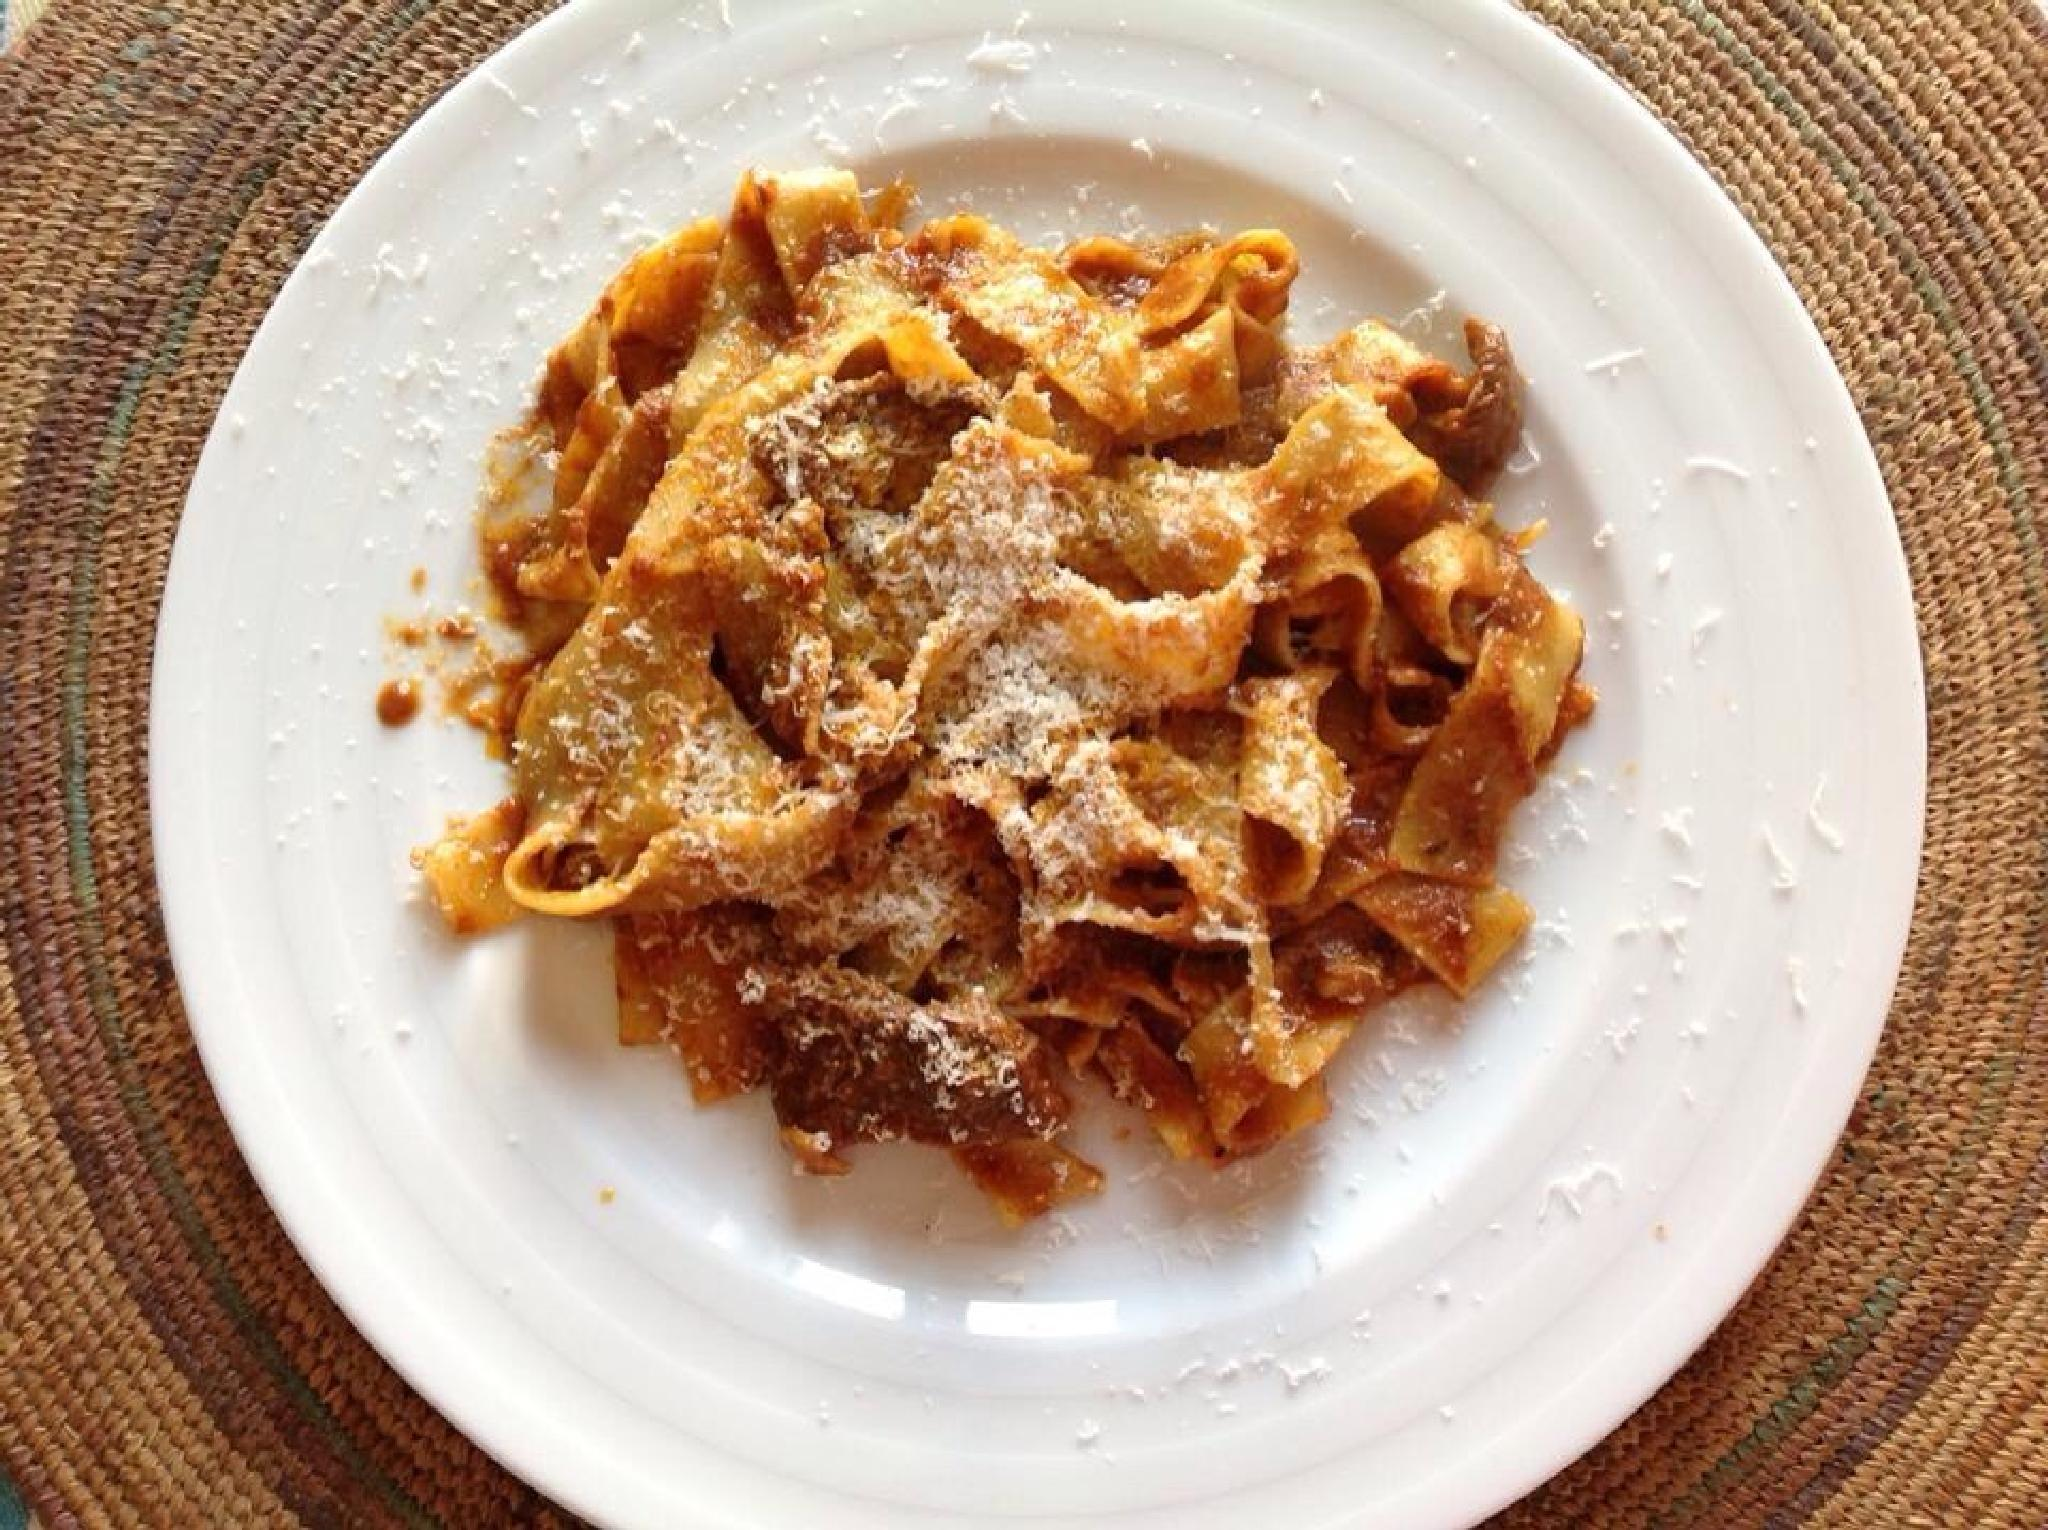 Fettuccine tomato sauce. by grossiroma